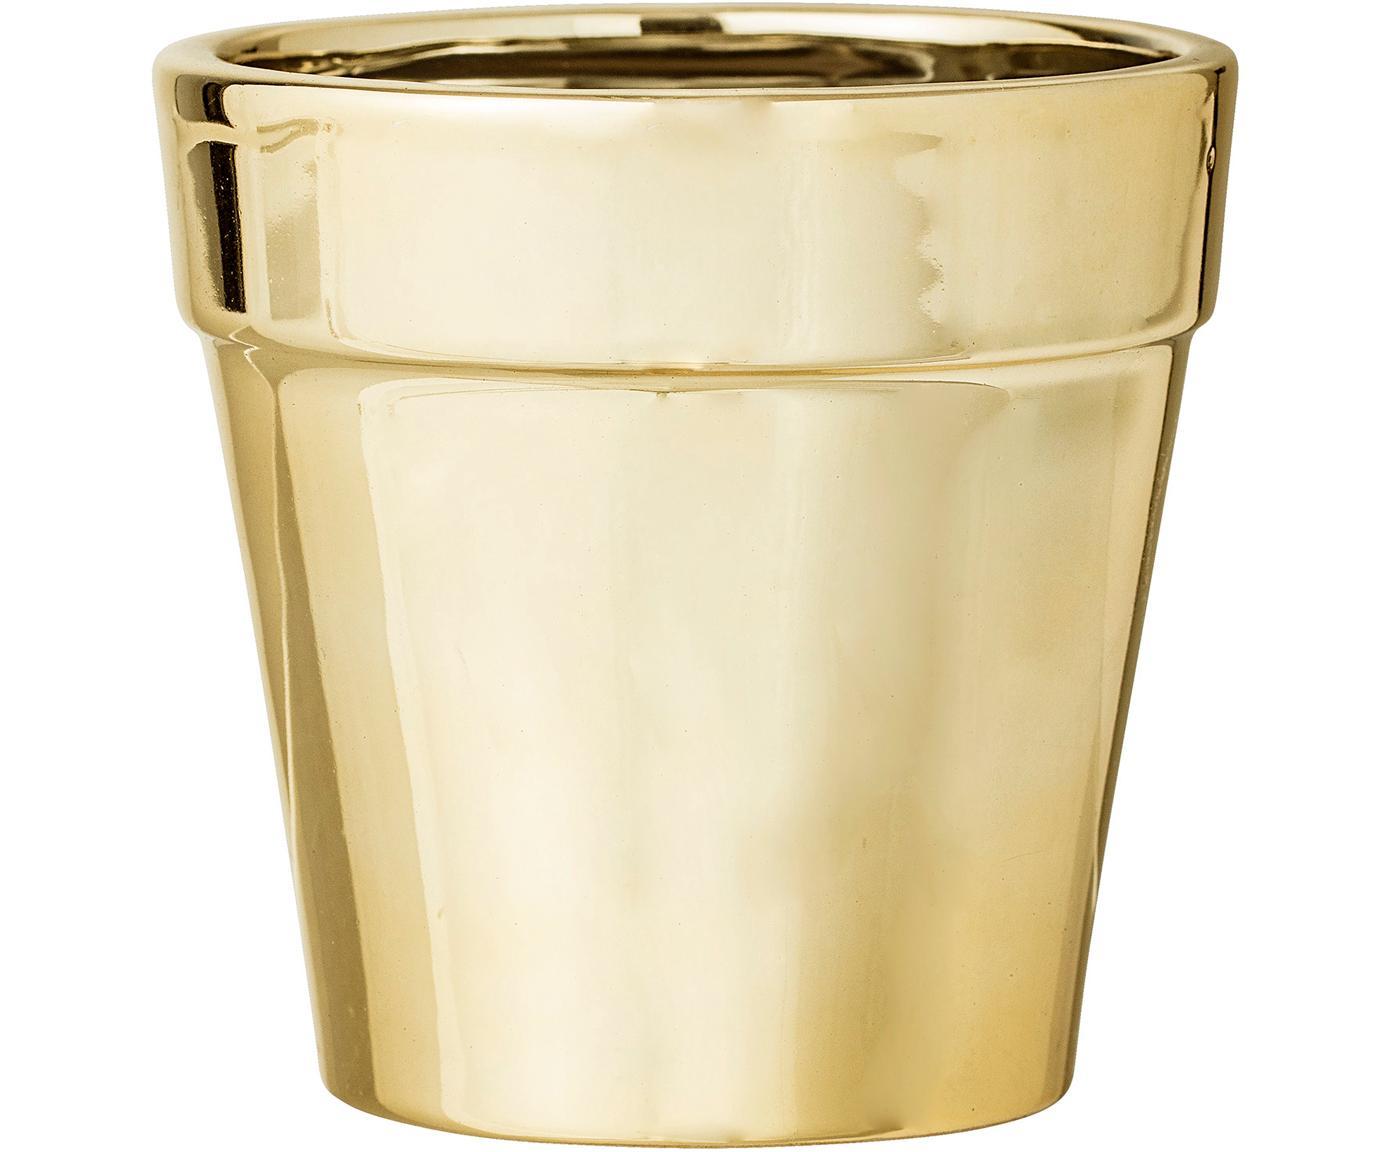 Übertopf Gladys, Steingut, Goldfarben, Ø 10 x H 10 cm